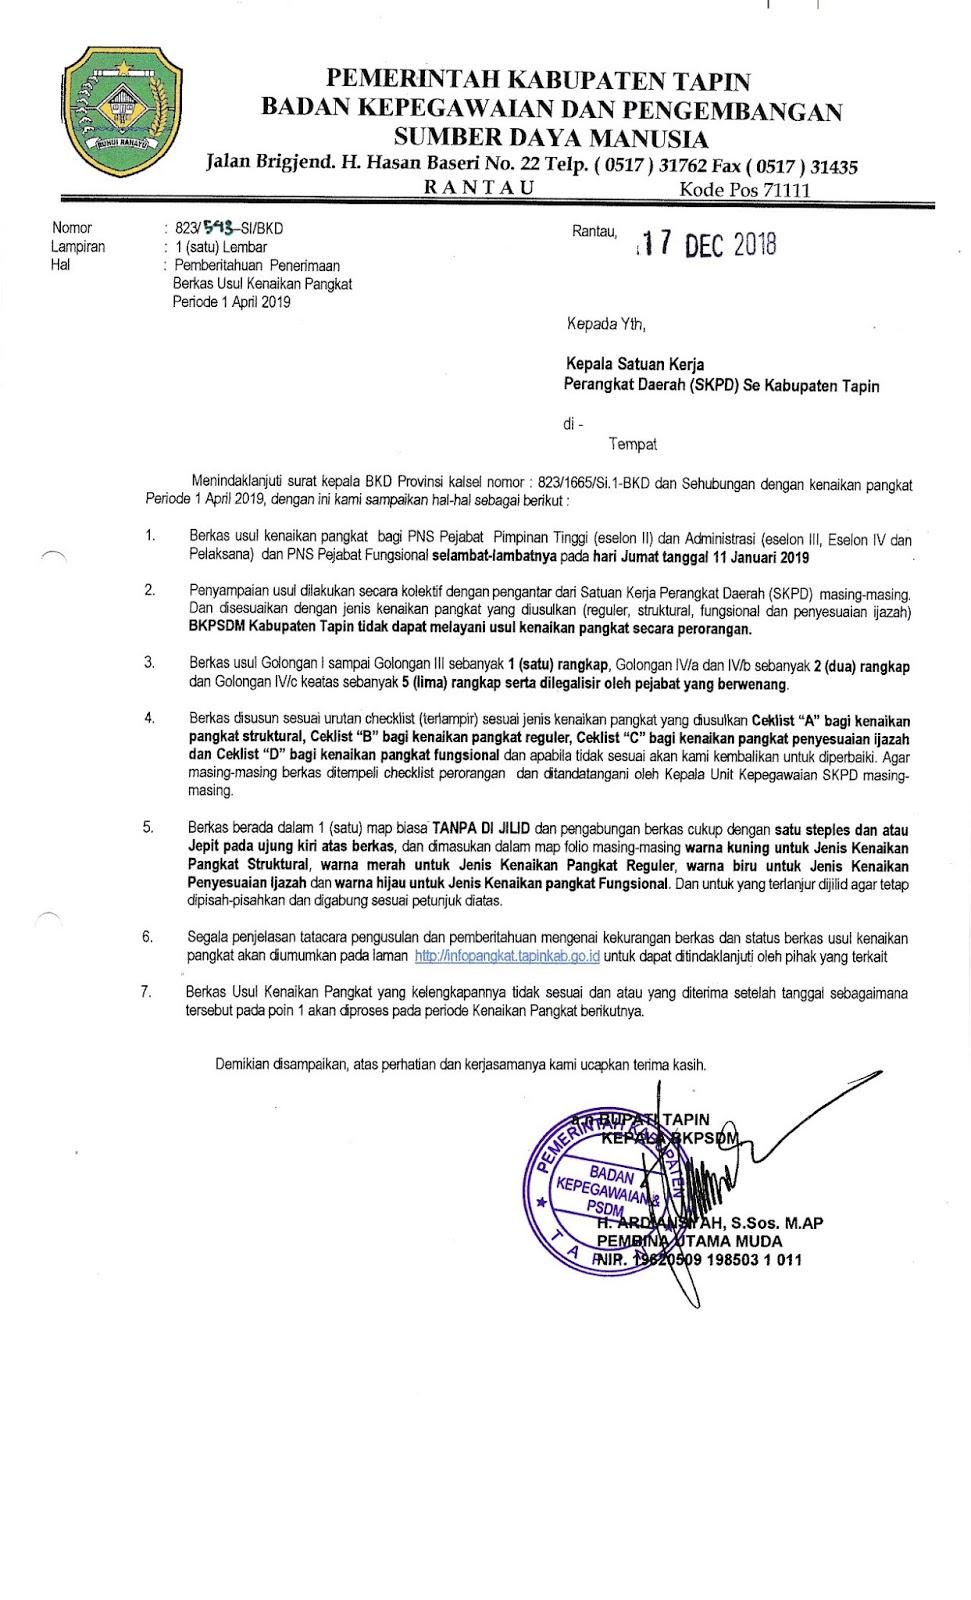 Info Kenaikan Pangkat Pns Kab Tapin Surat Pemberitahuan Penerimaan Berkas Usul Kenaikan Pangkat Periode April 2019